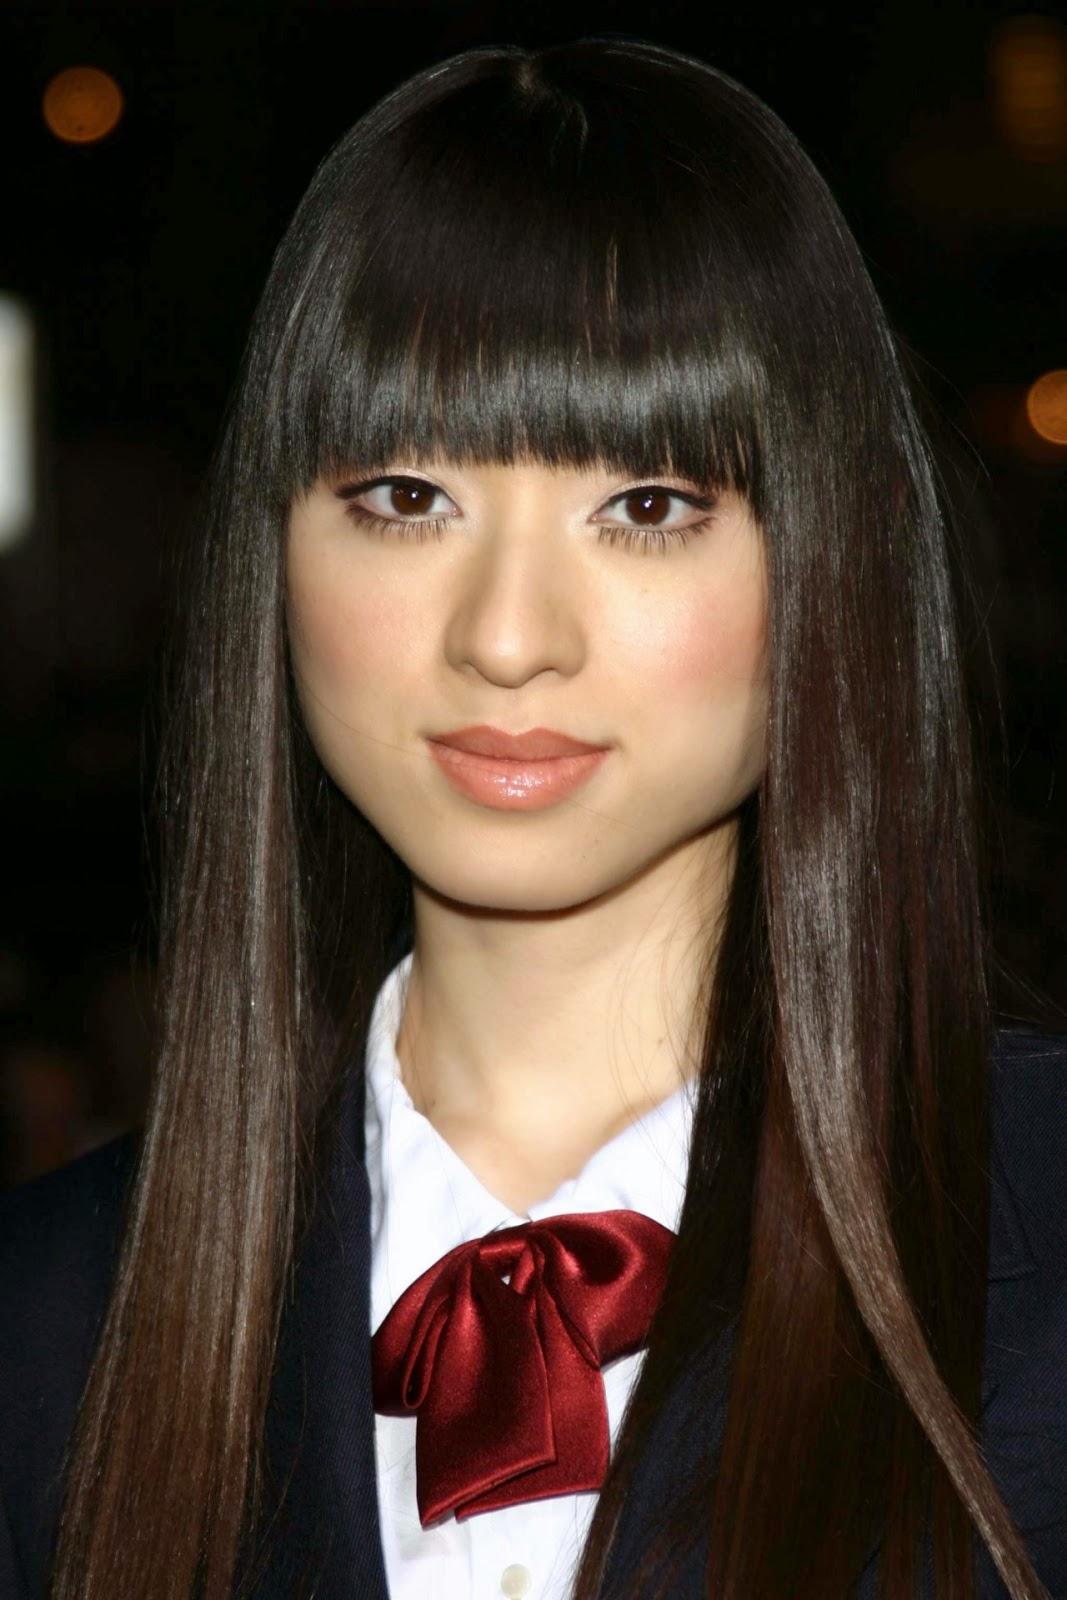 HC - BC: Chiaki Kuriyama Japanese Actress Singer Model Evan Rachel Wood